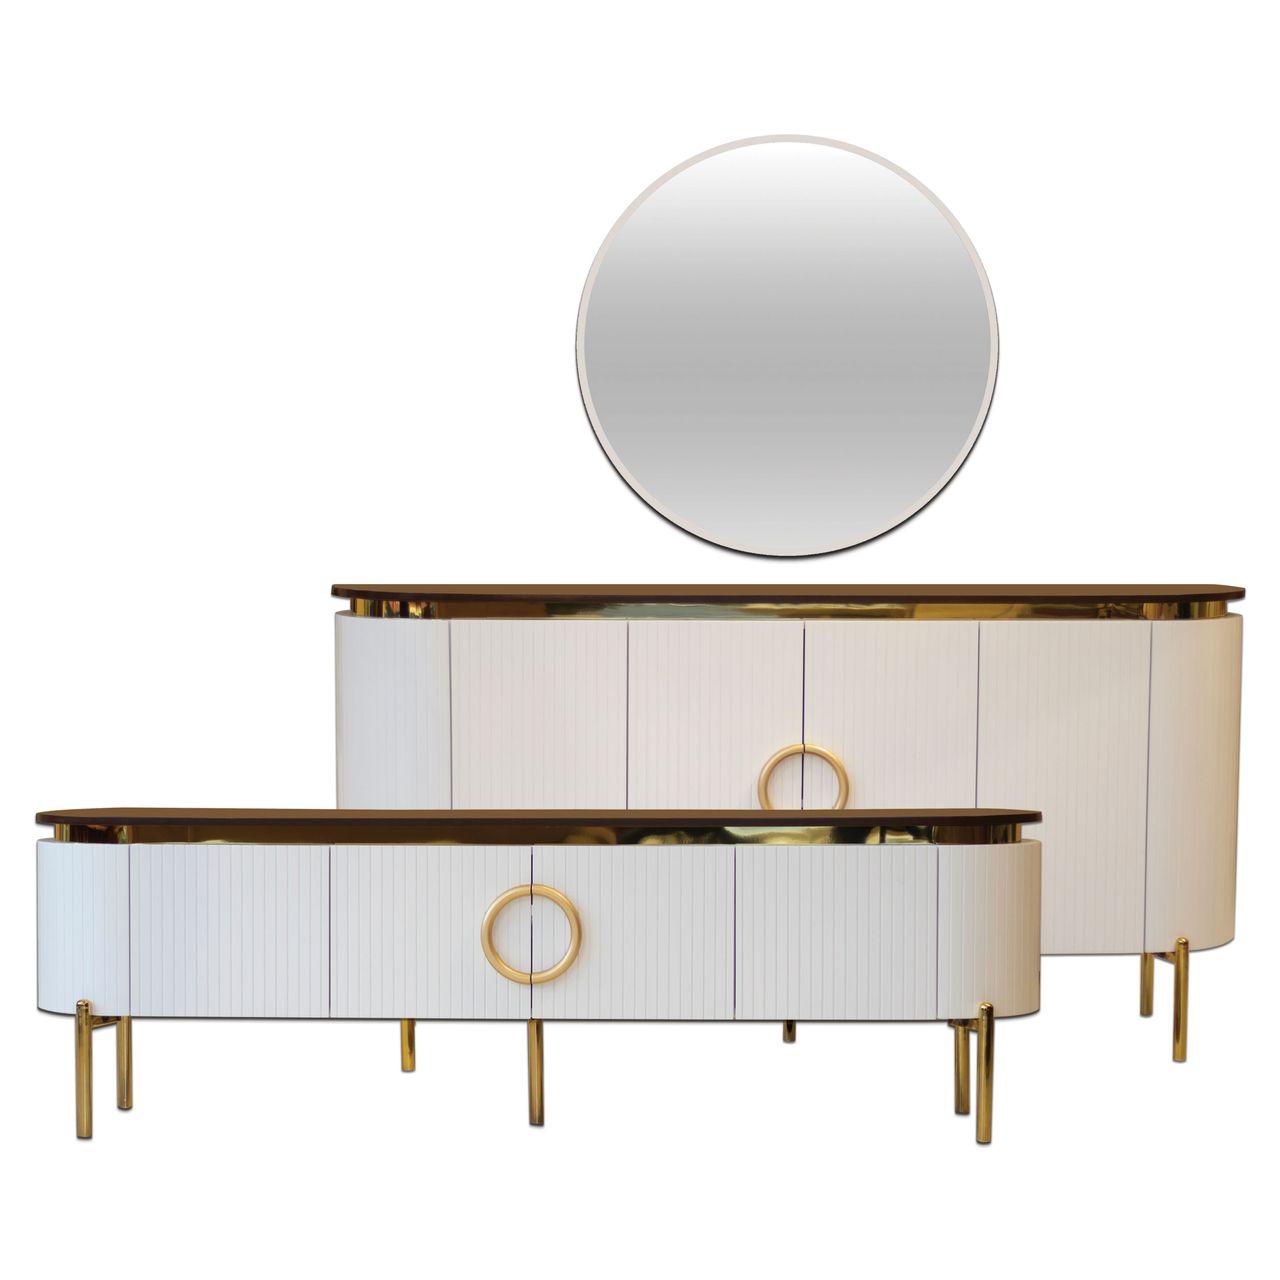 آینه و کنسول مدل آرتا به همراه میز تلویزیون